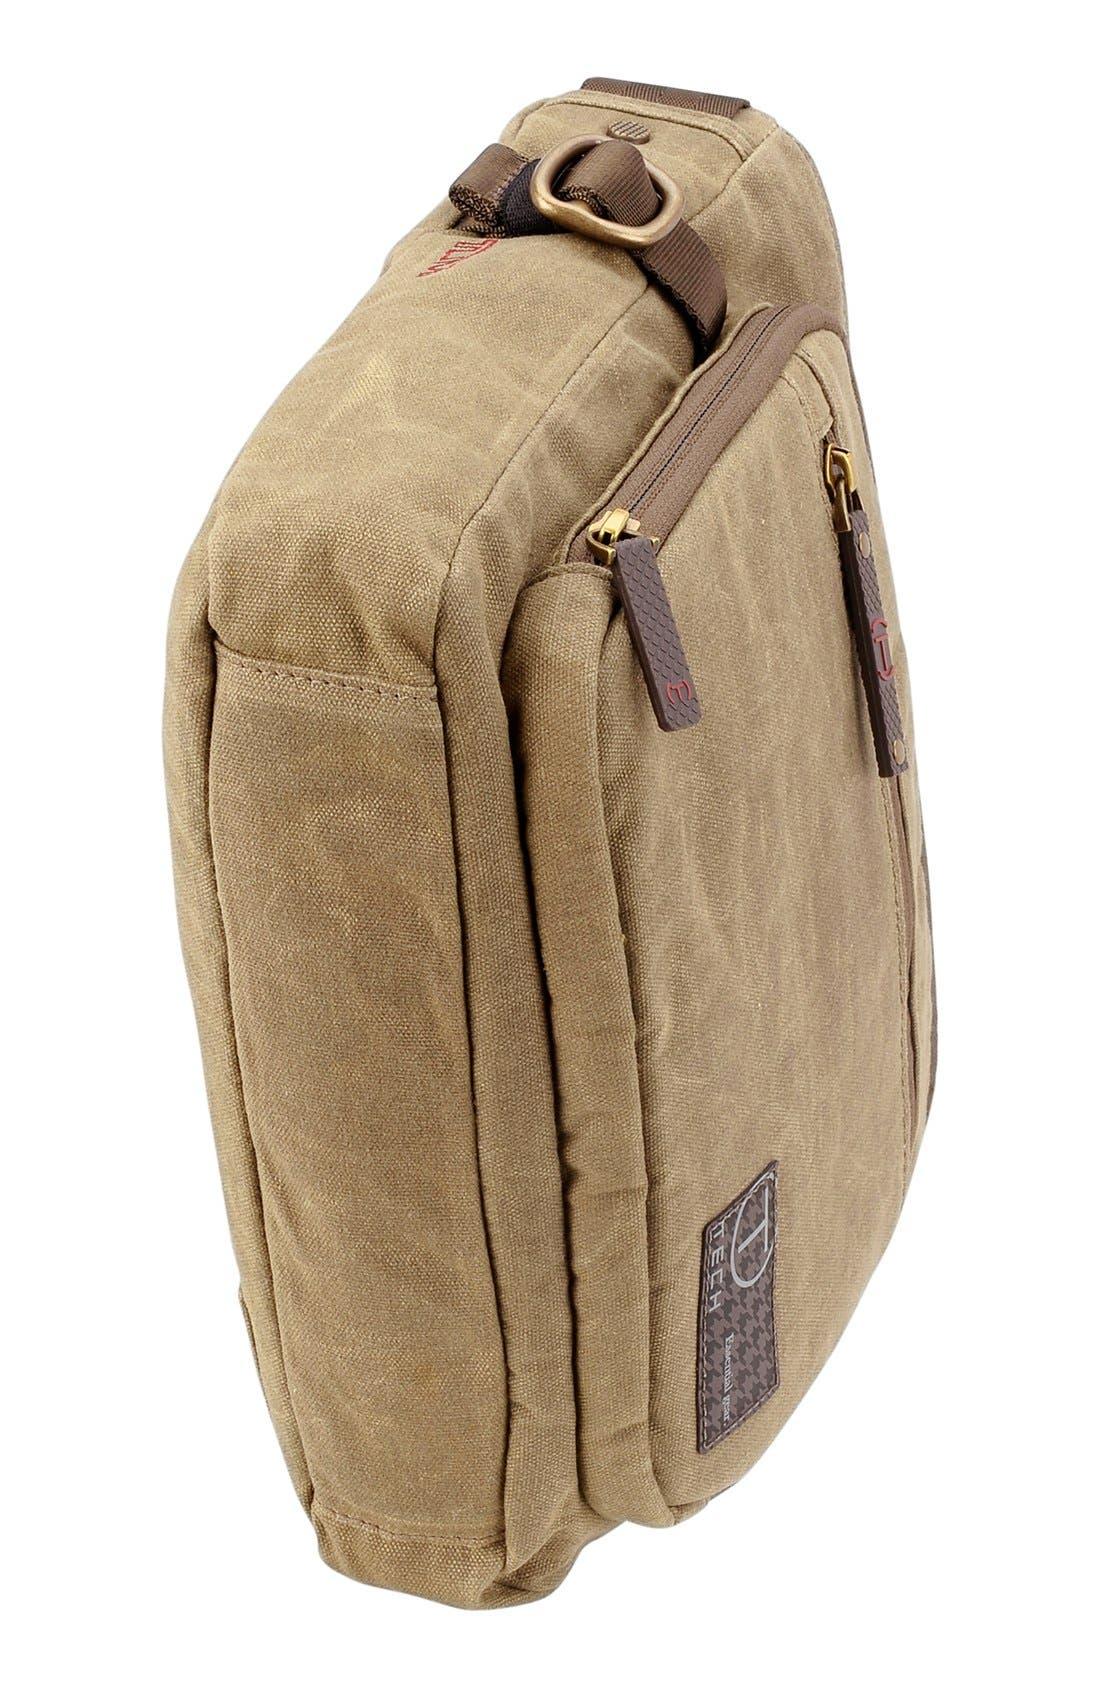 Alternate Image 3  - T-Tech by Tumi 'Icon - King' Crossbody Bag